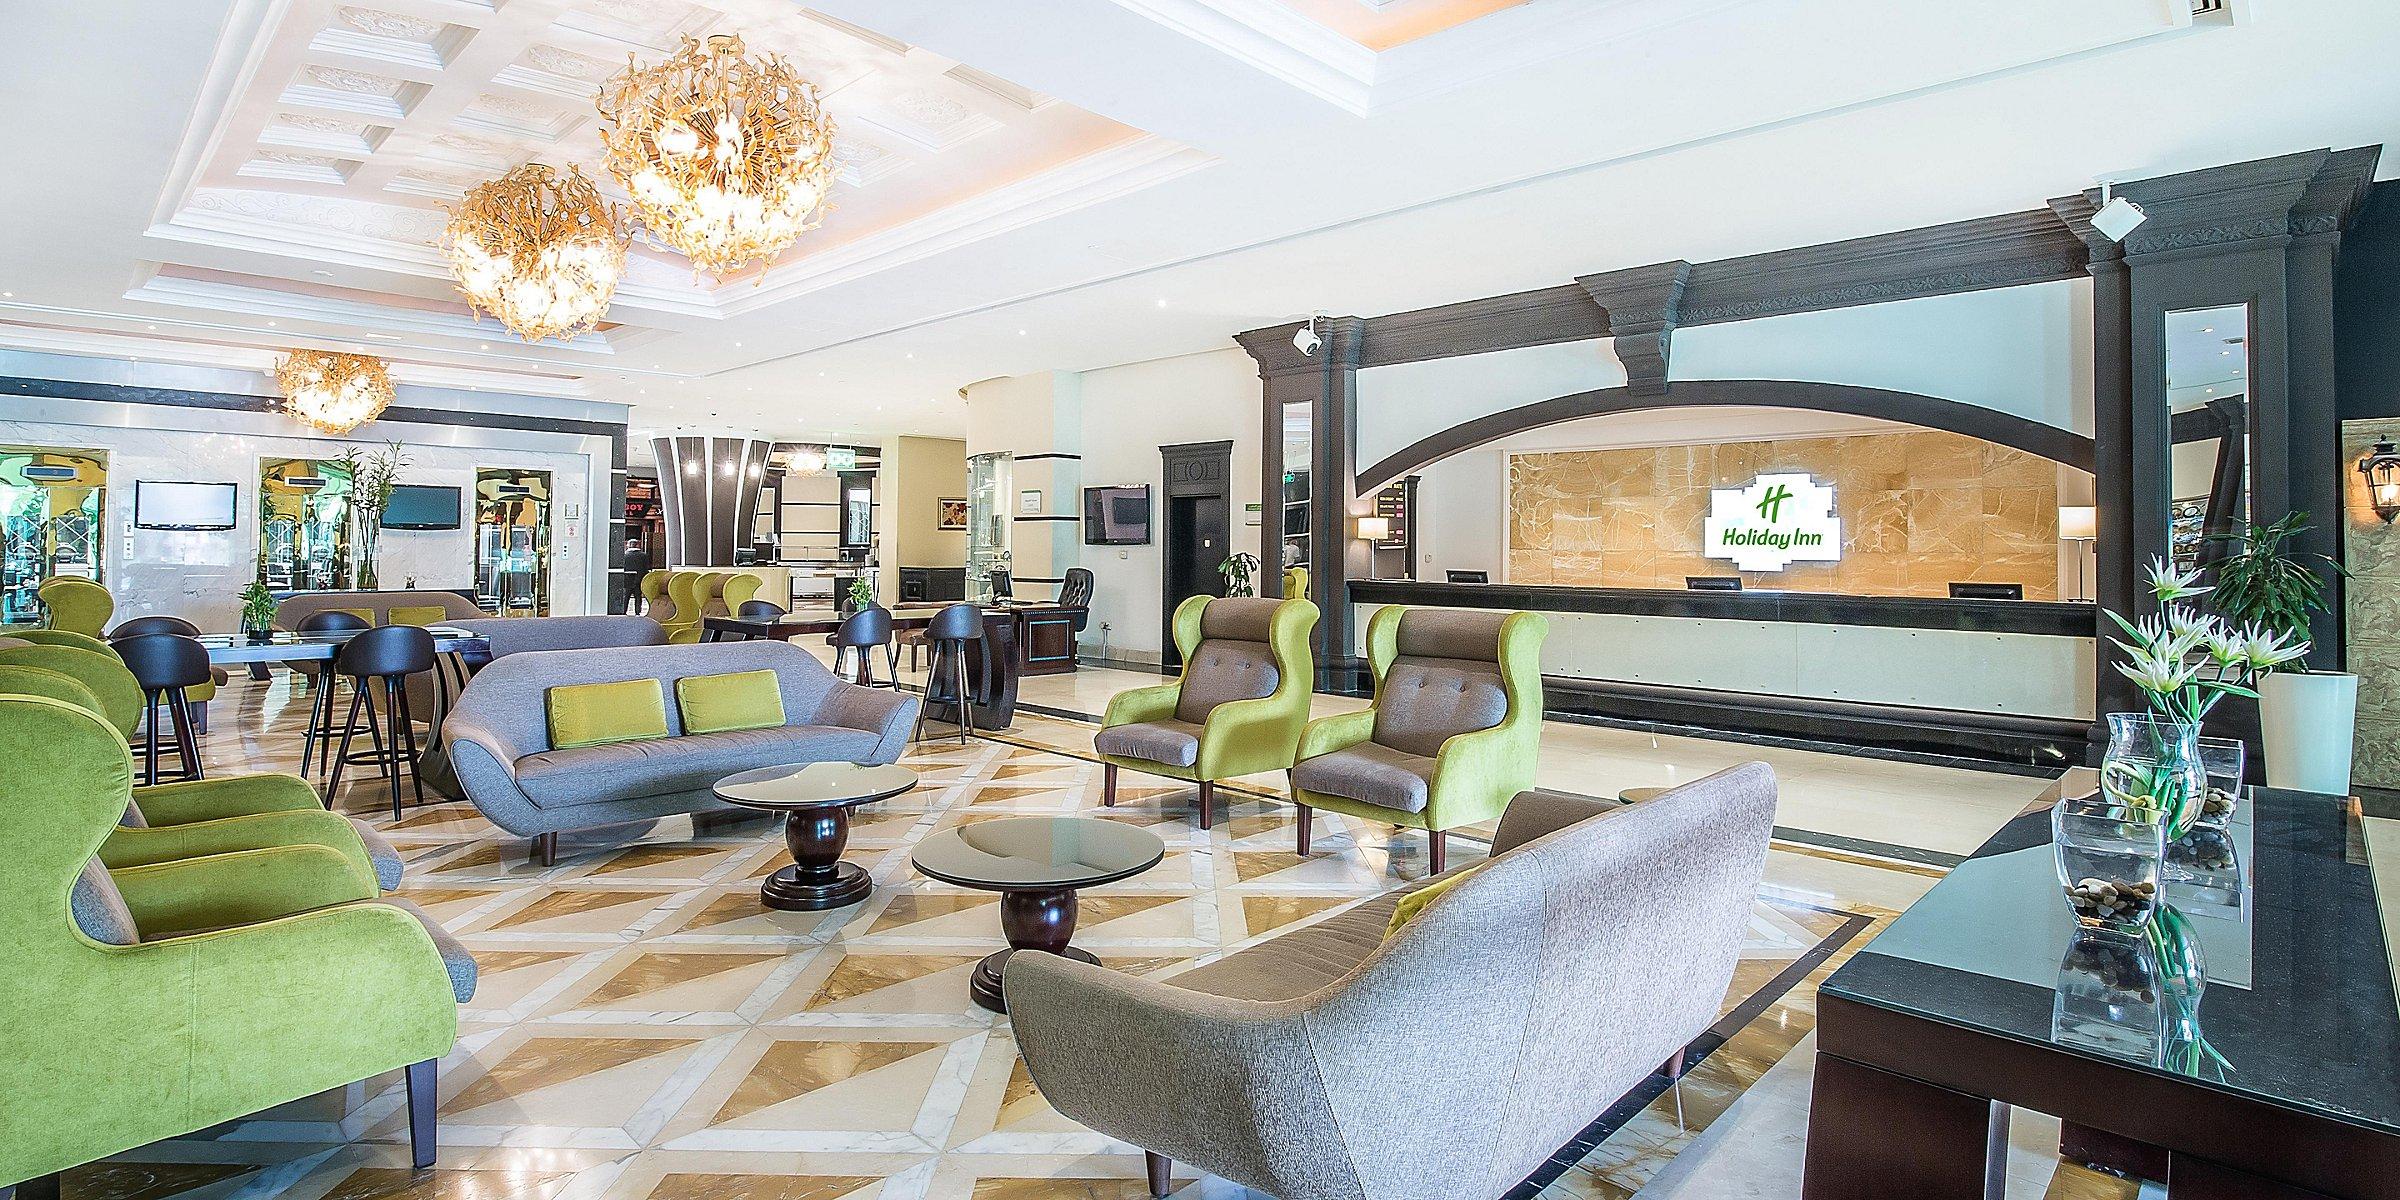 Holiday Inn Bur Dubai - Embassy District Hotel by IHG